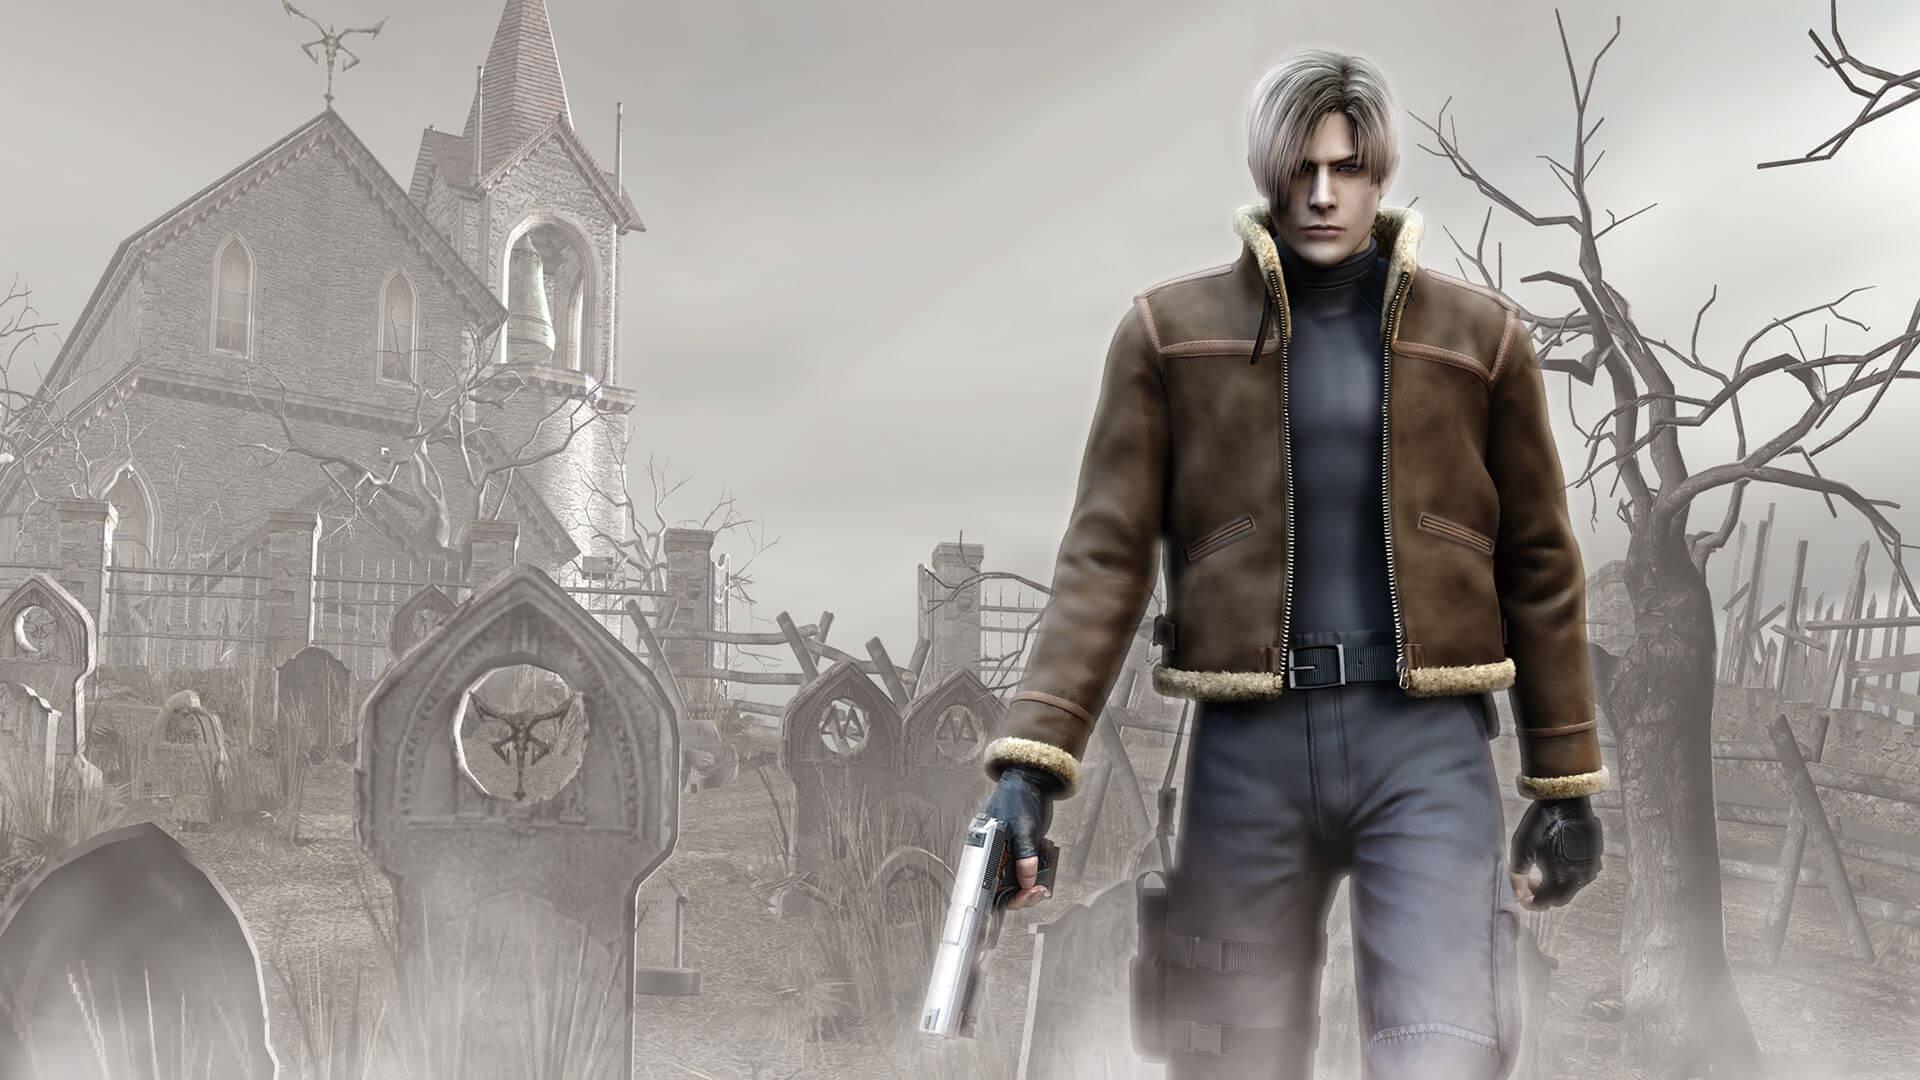 Resident Evil 4 Switch